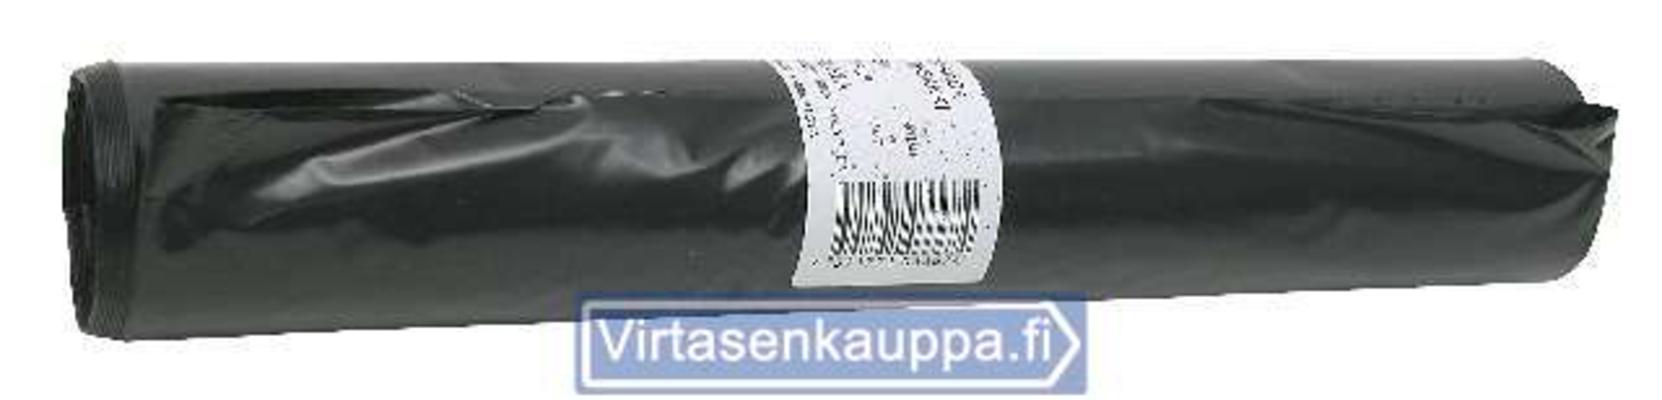 JÄTESÄKKI 200L 750X1360 10KPL